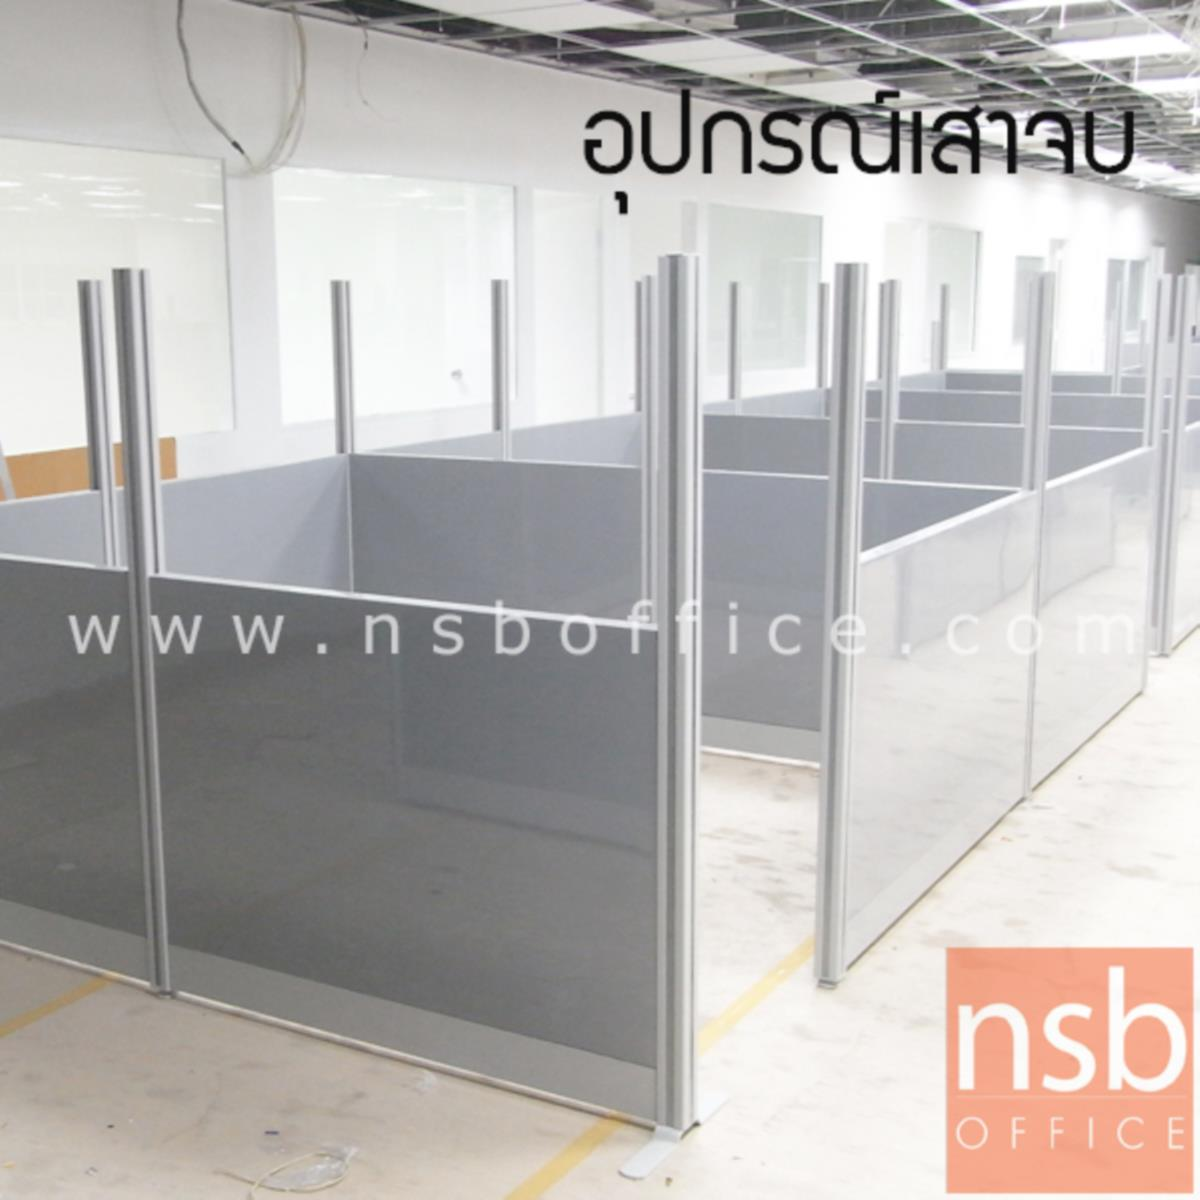 P01A019:เสาจบพาร์ทิชั่น P-01-NSB ขนาด ก5.5 ซม. (Post)